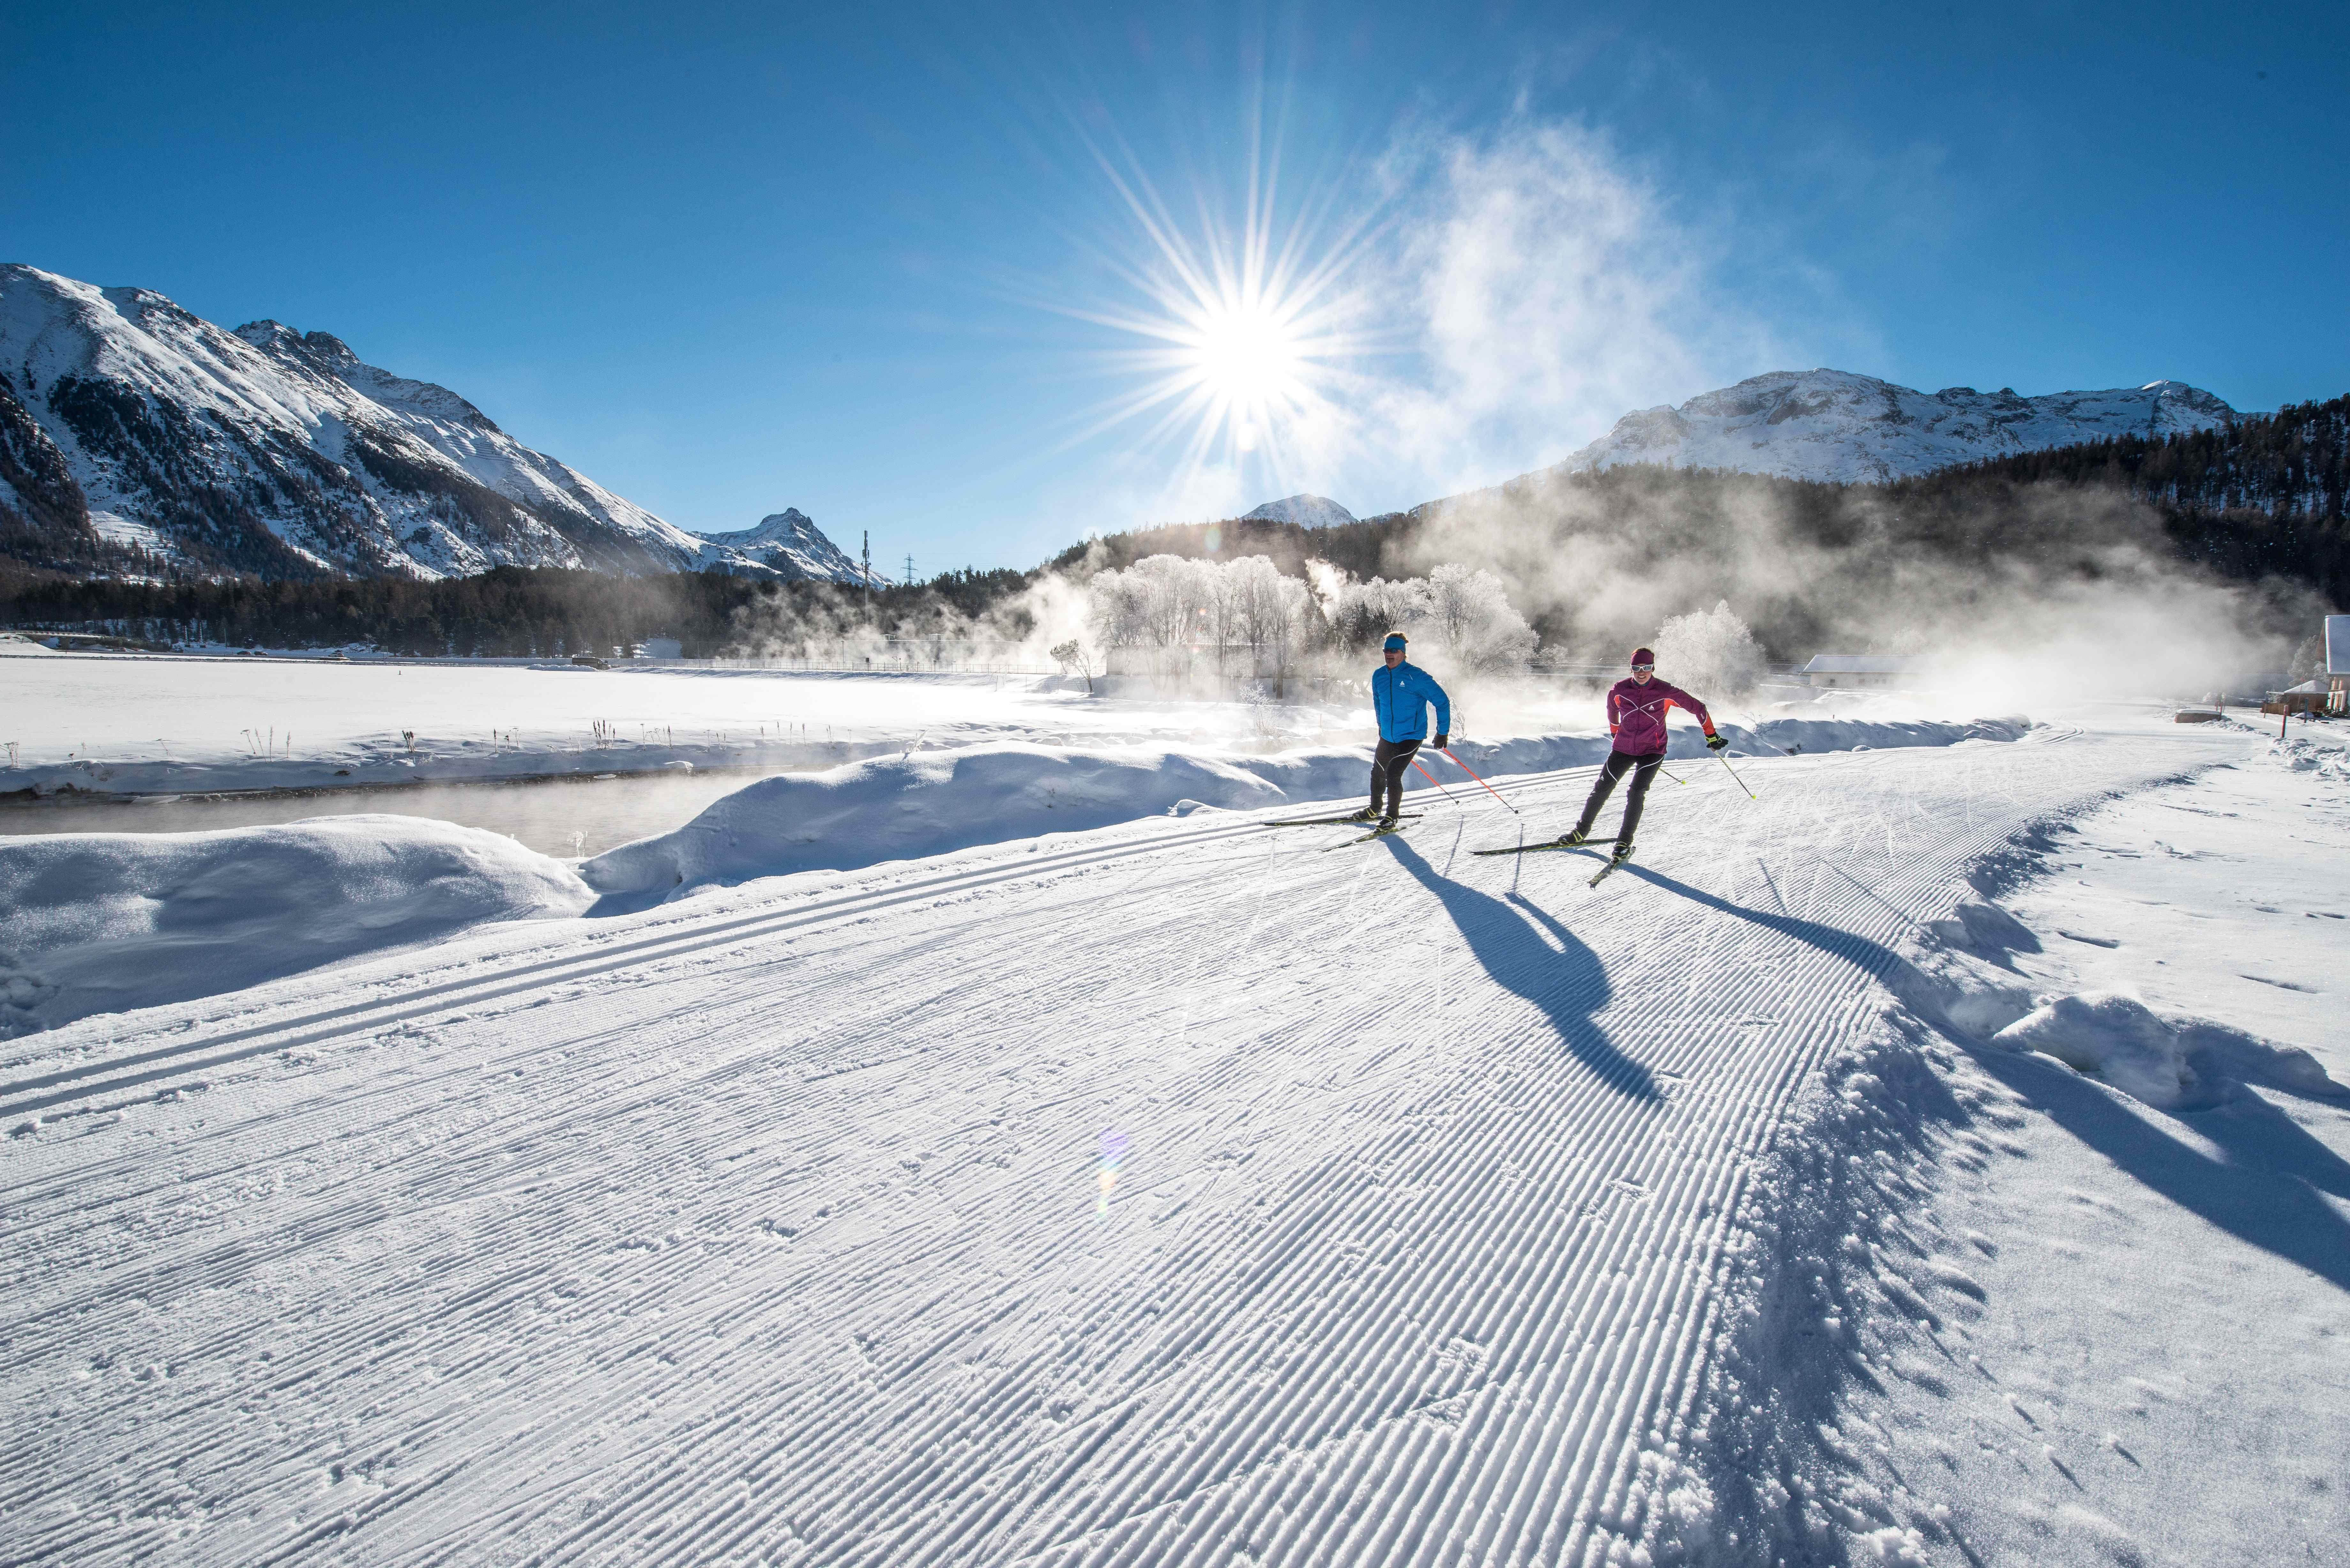 Cross-country ski rental stations